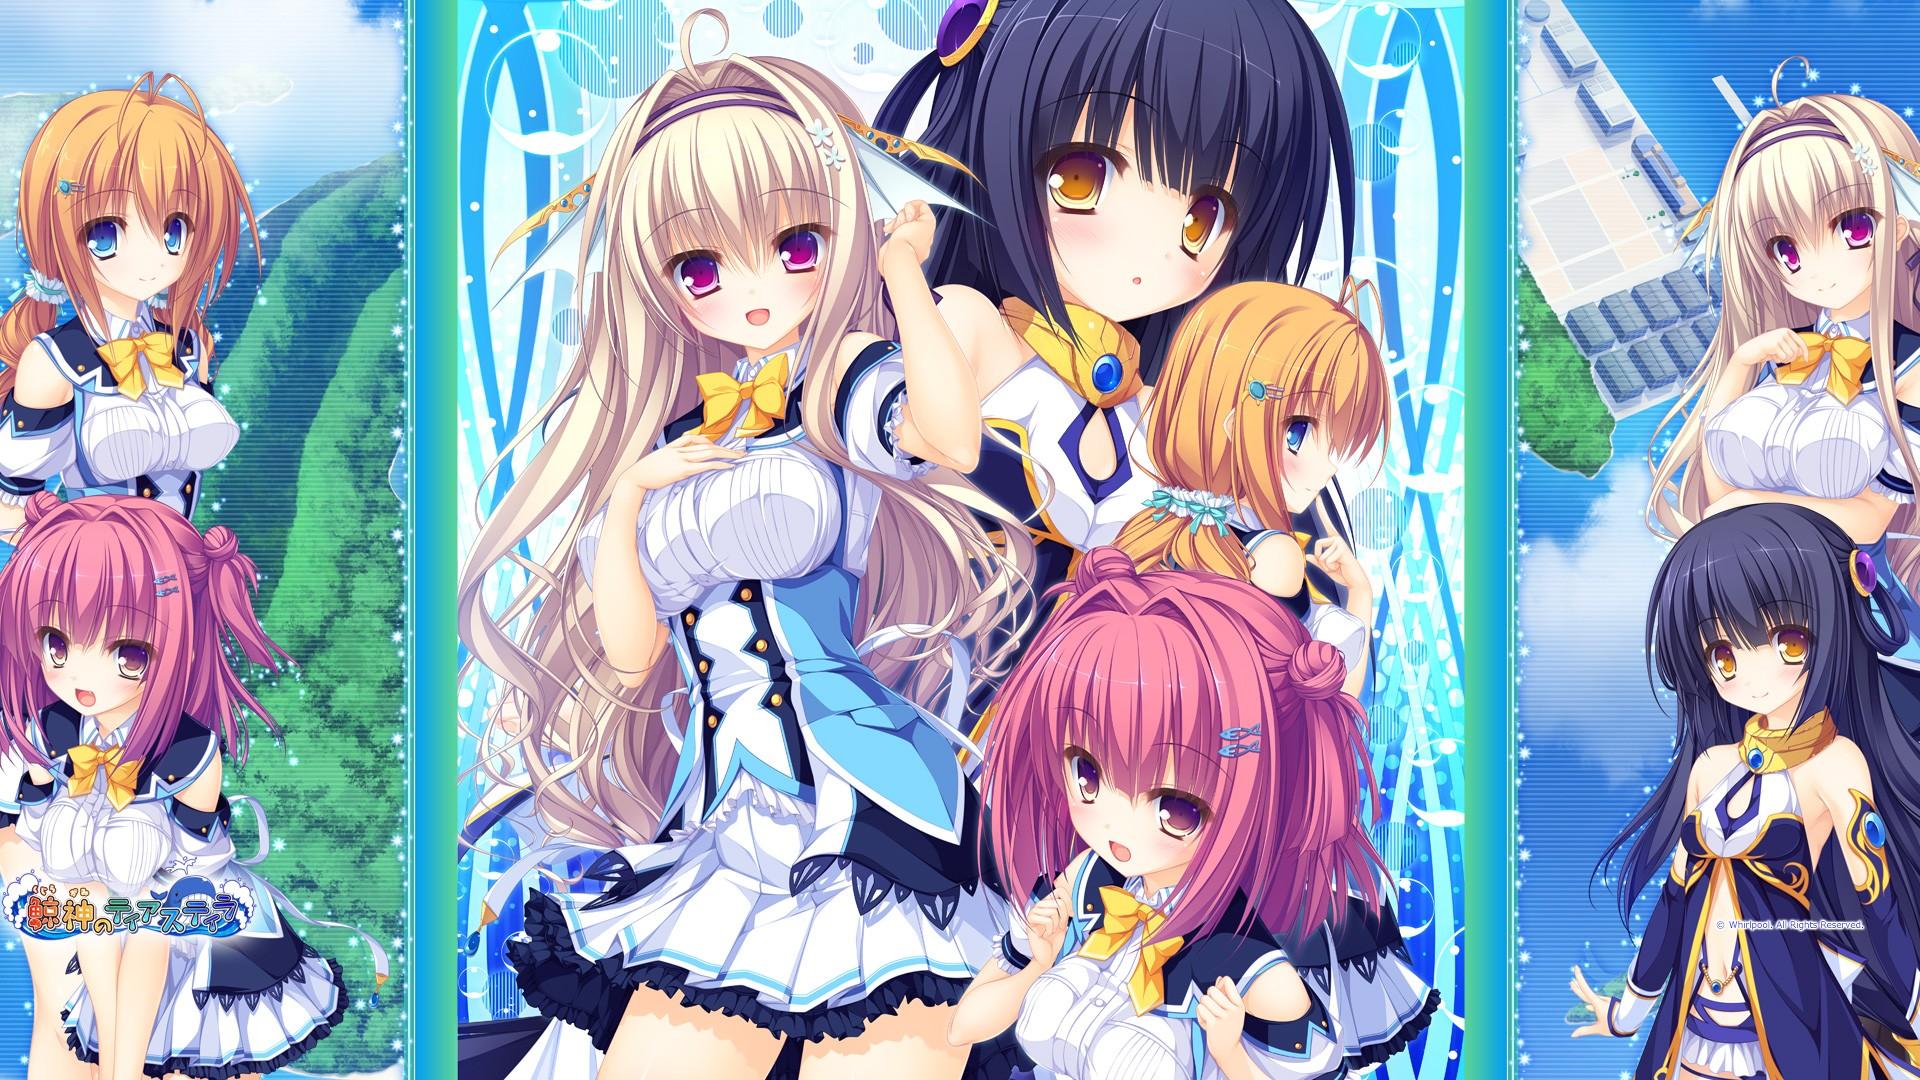 Narumi Marine Kamitouno Ena Visual Novel Anime Girls Riru Whale